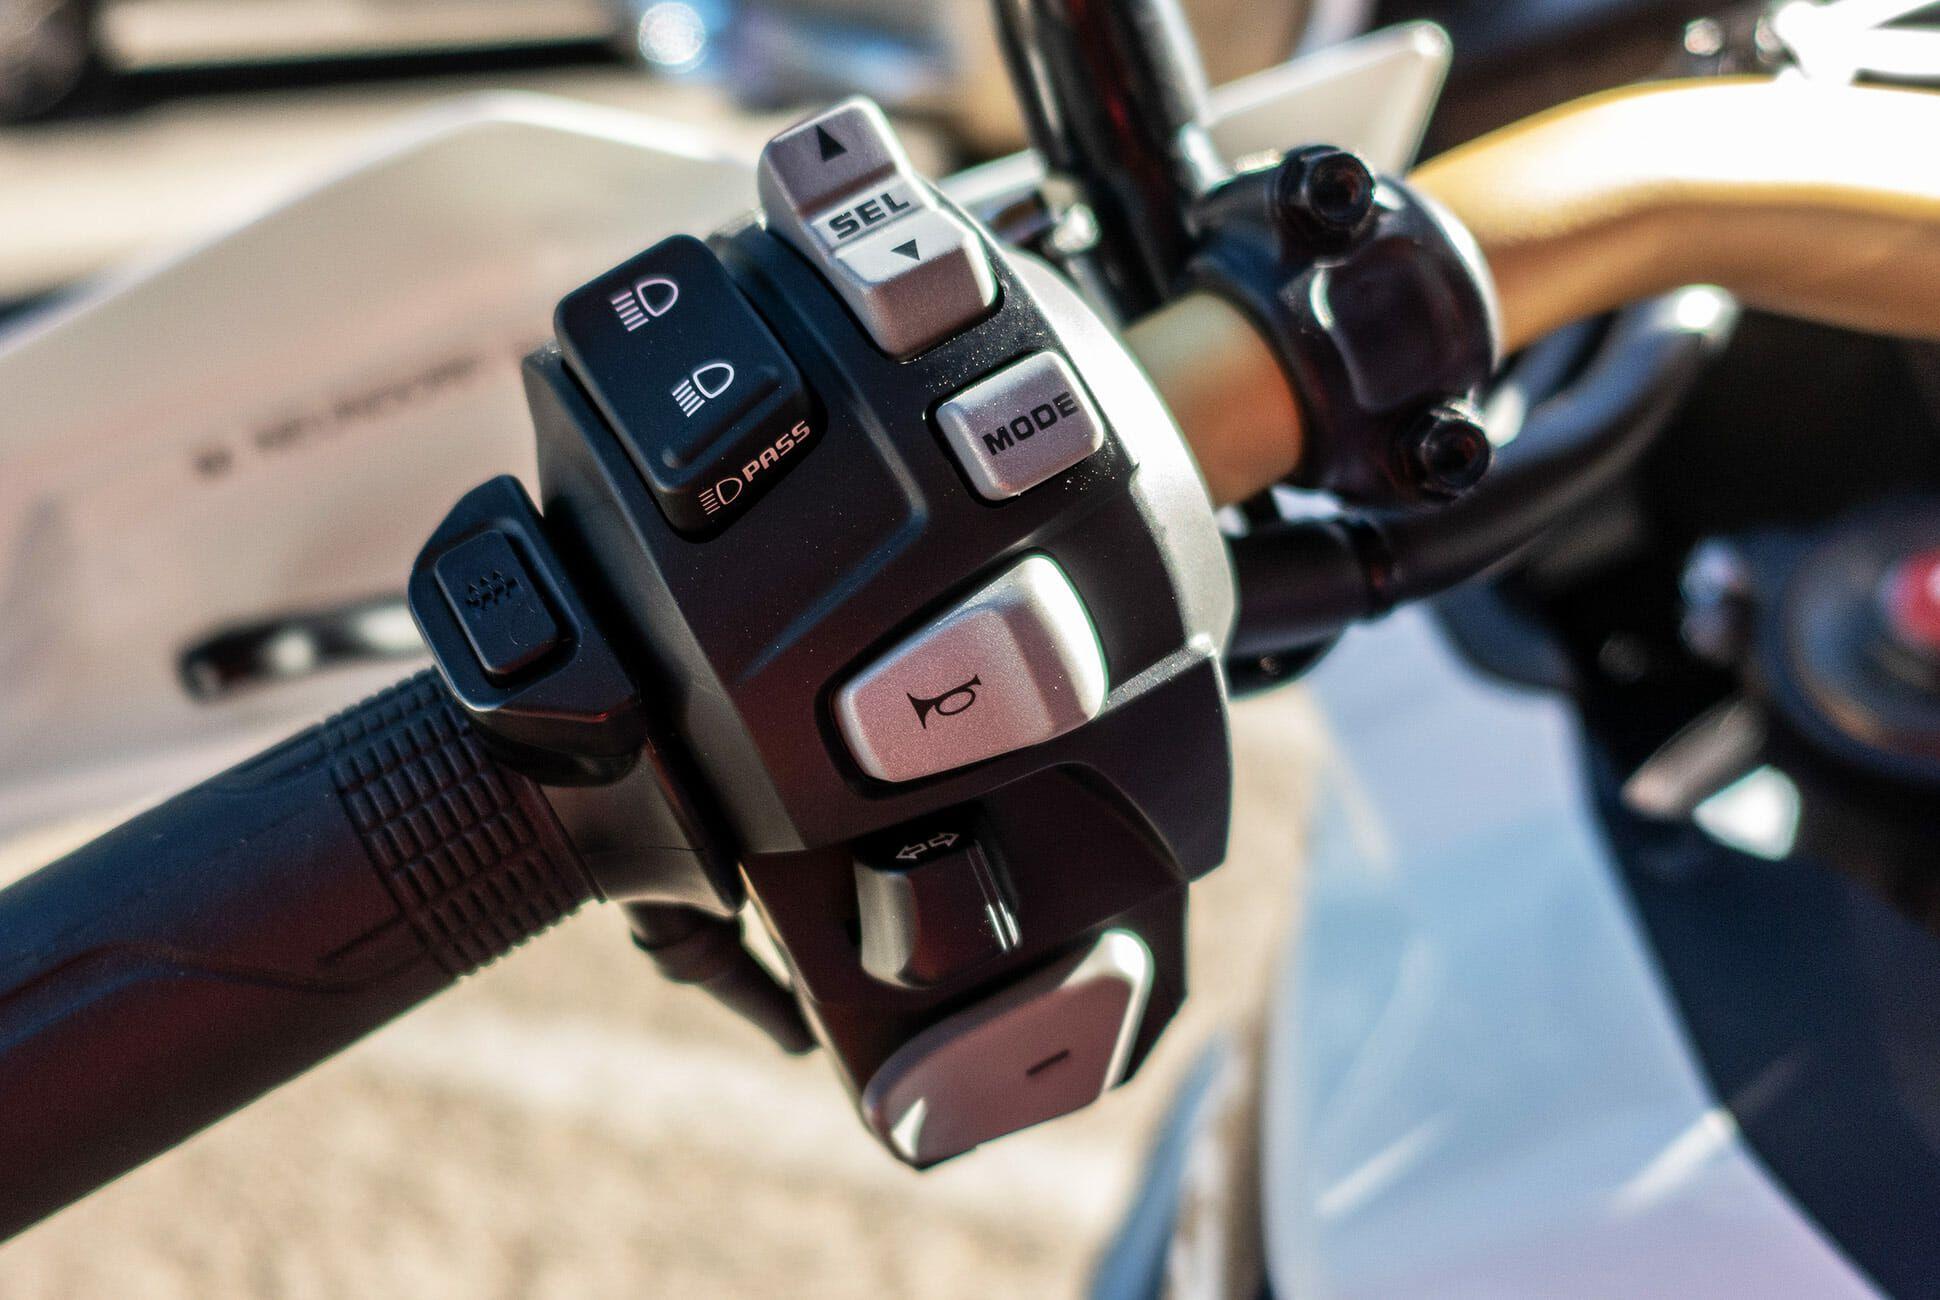 2018-Honda-Africa-Twin-Review-gear-patrol-slide-4